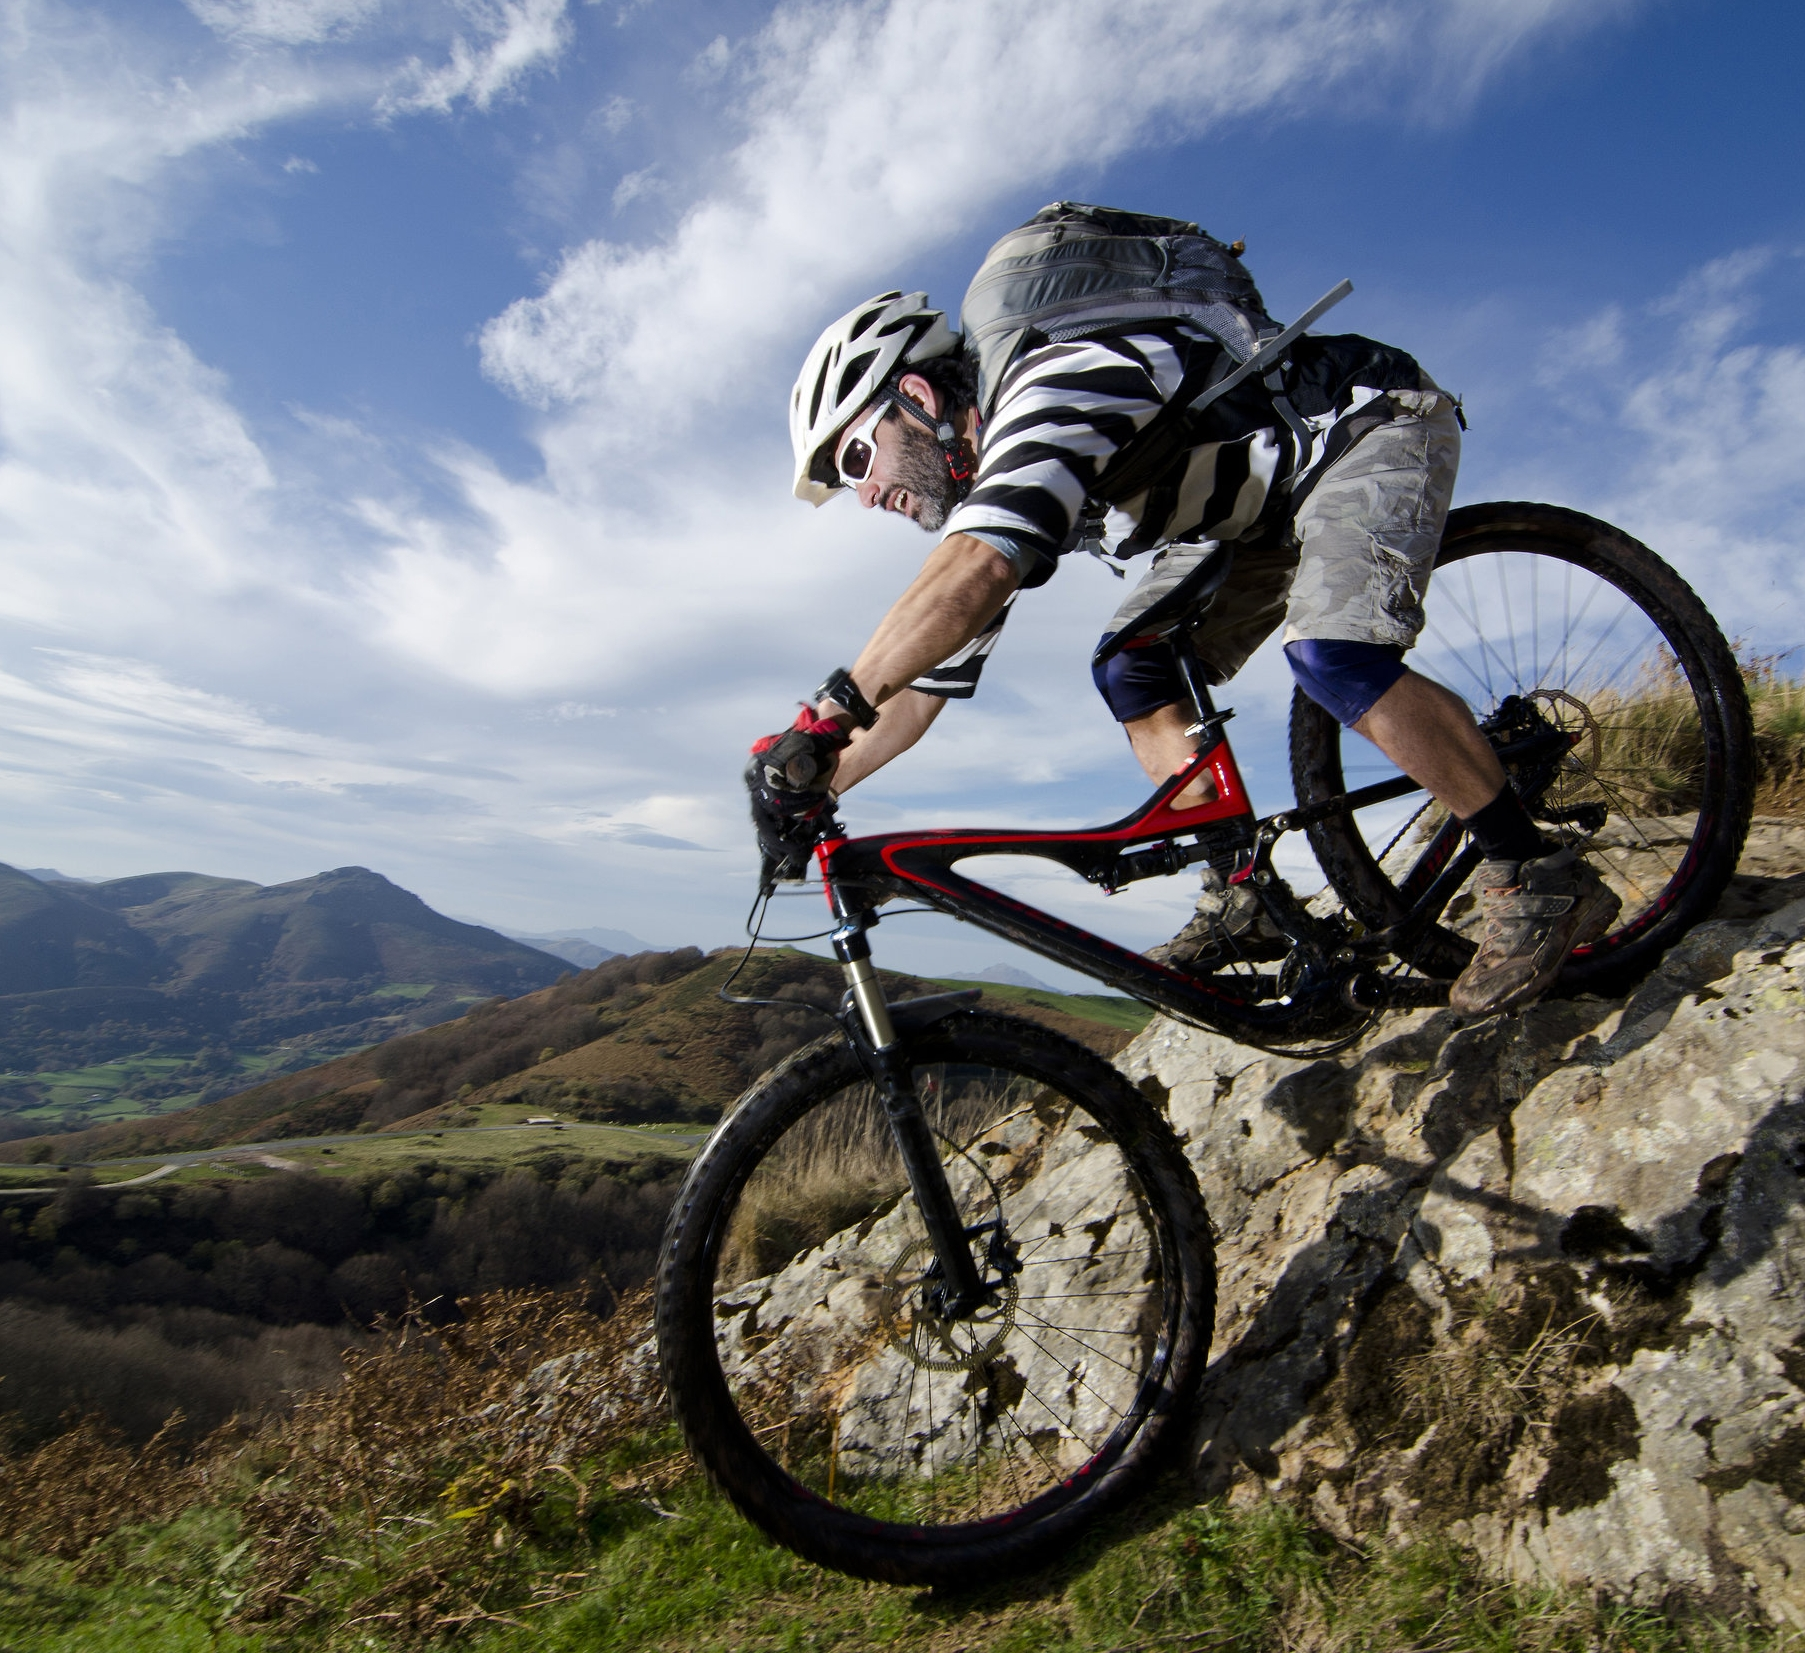 shutterstock_mountainbiker.jpg